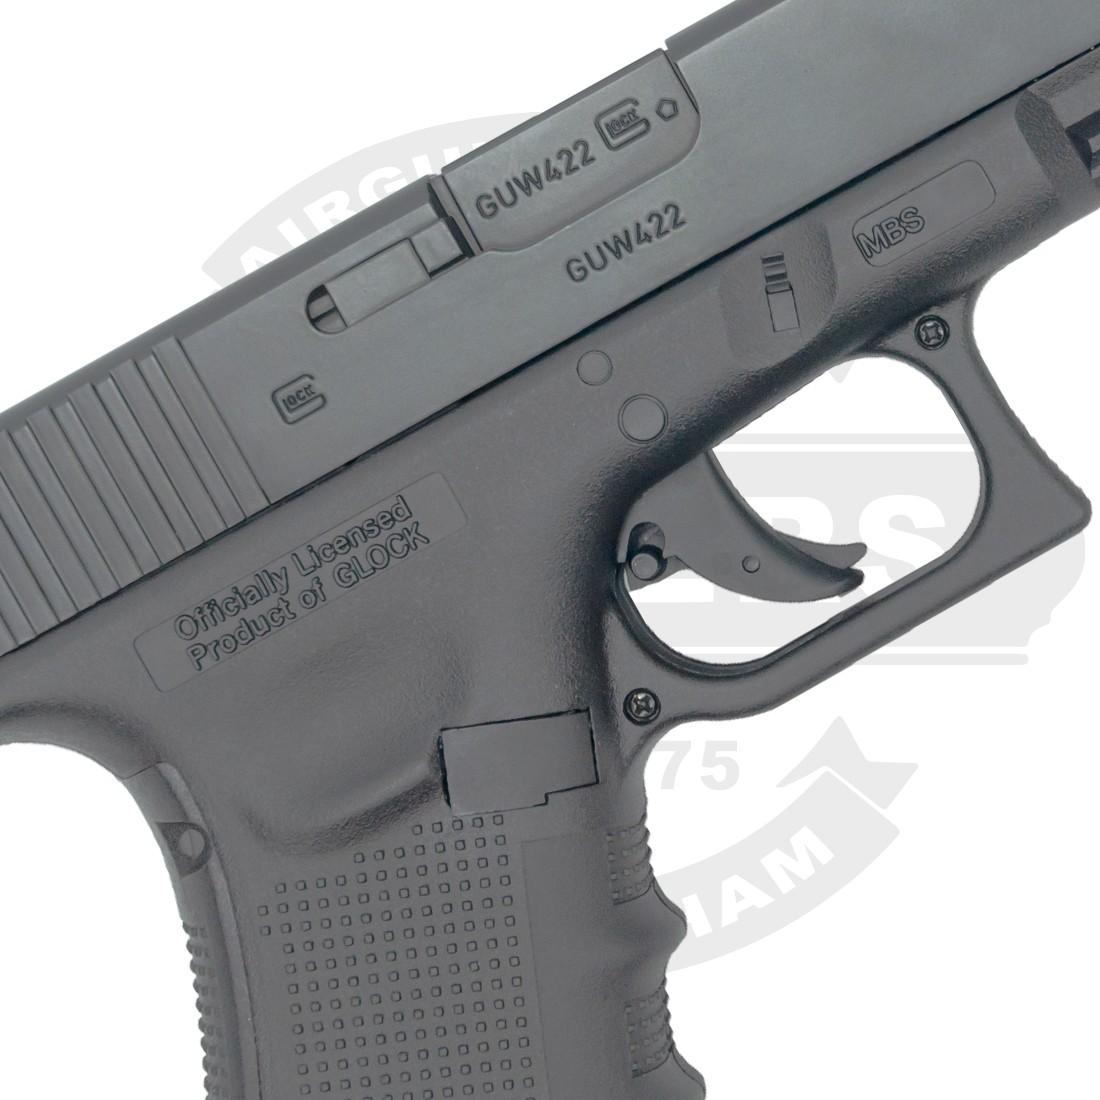 Umarex Glock 22 4 5mm BB - New Air Guns - Airguns